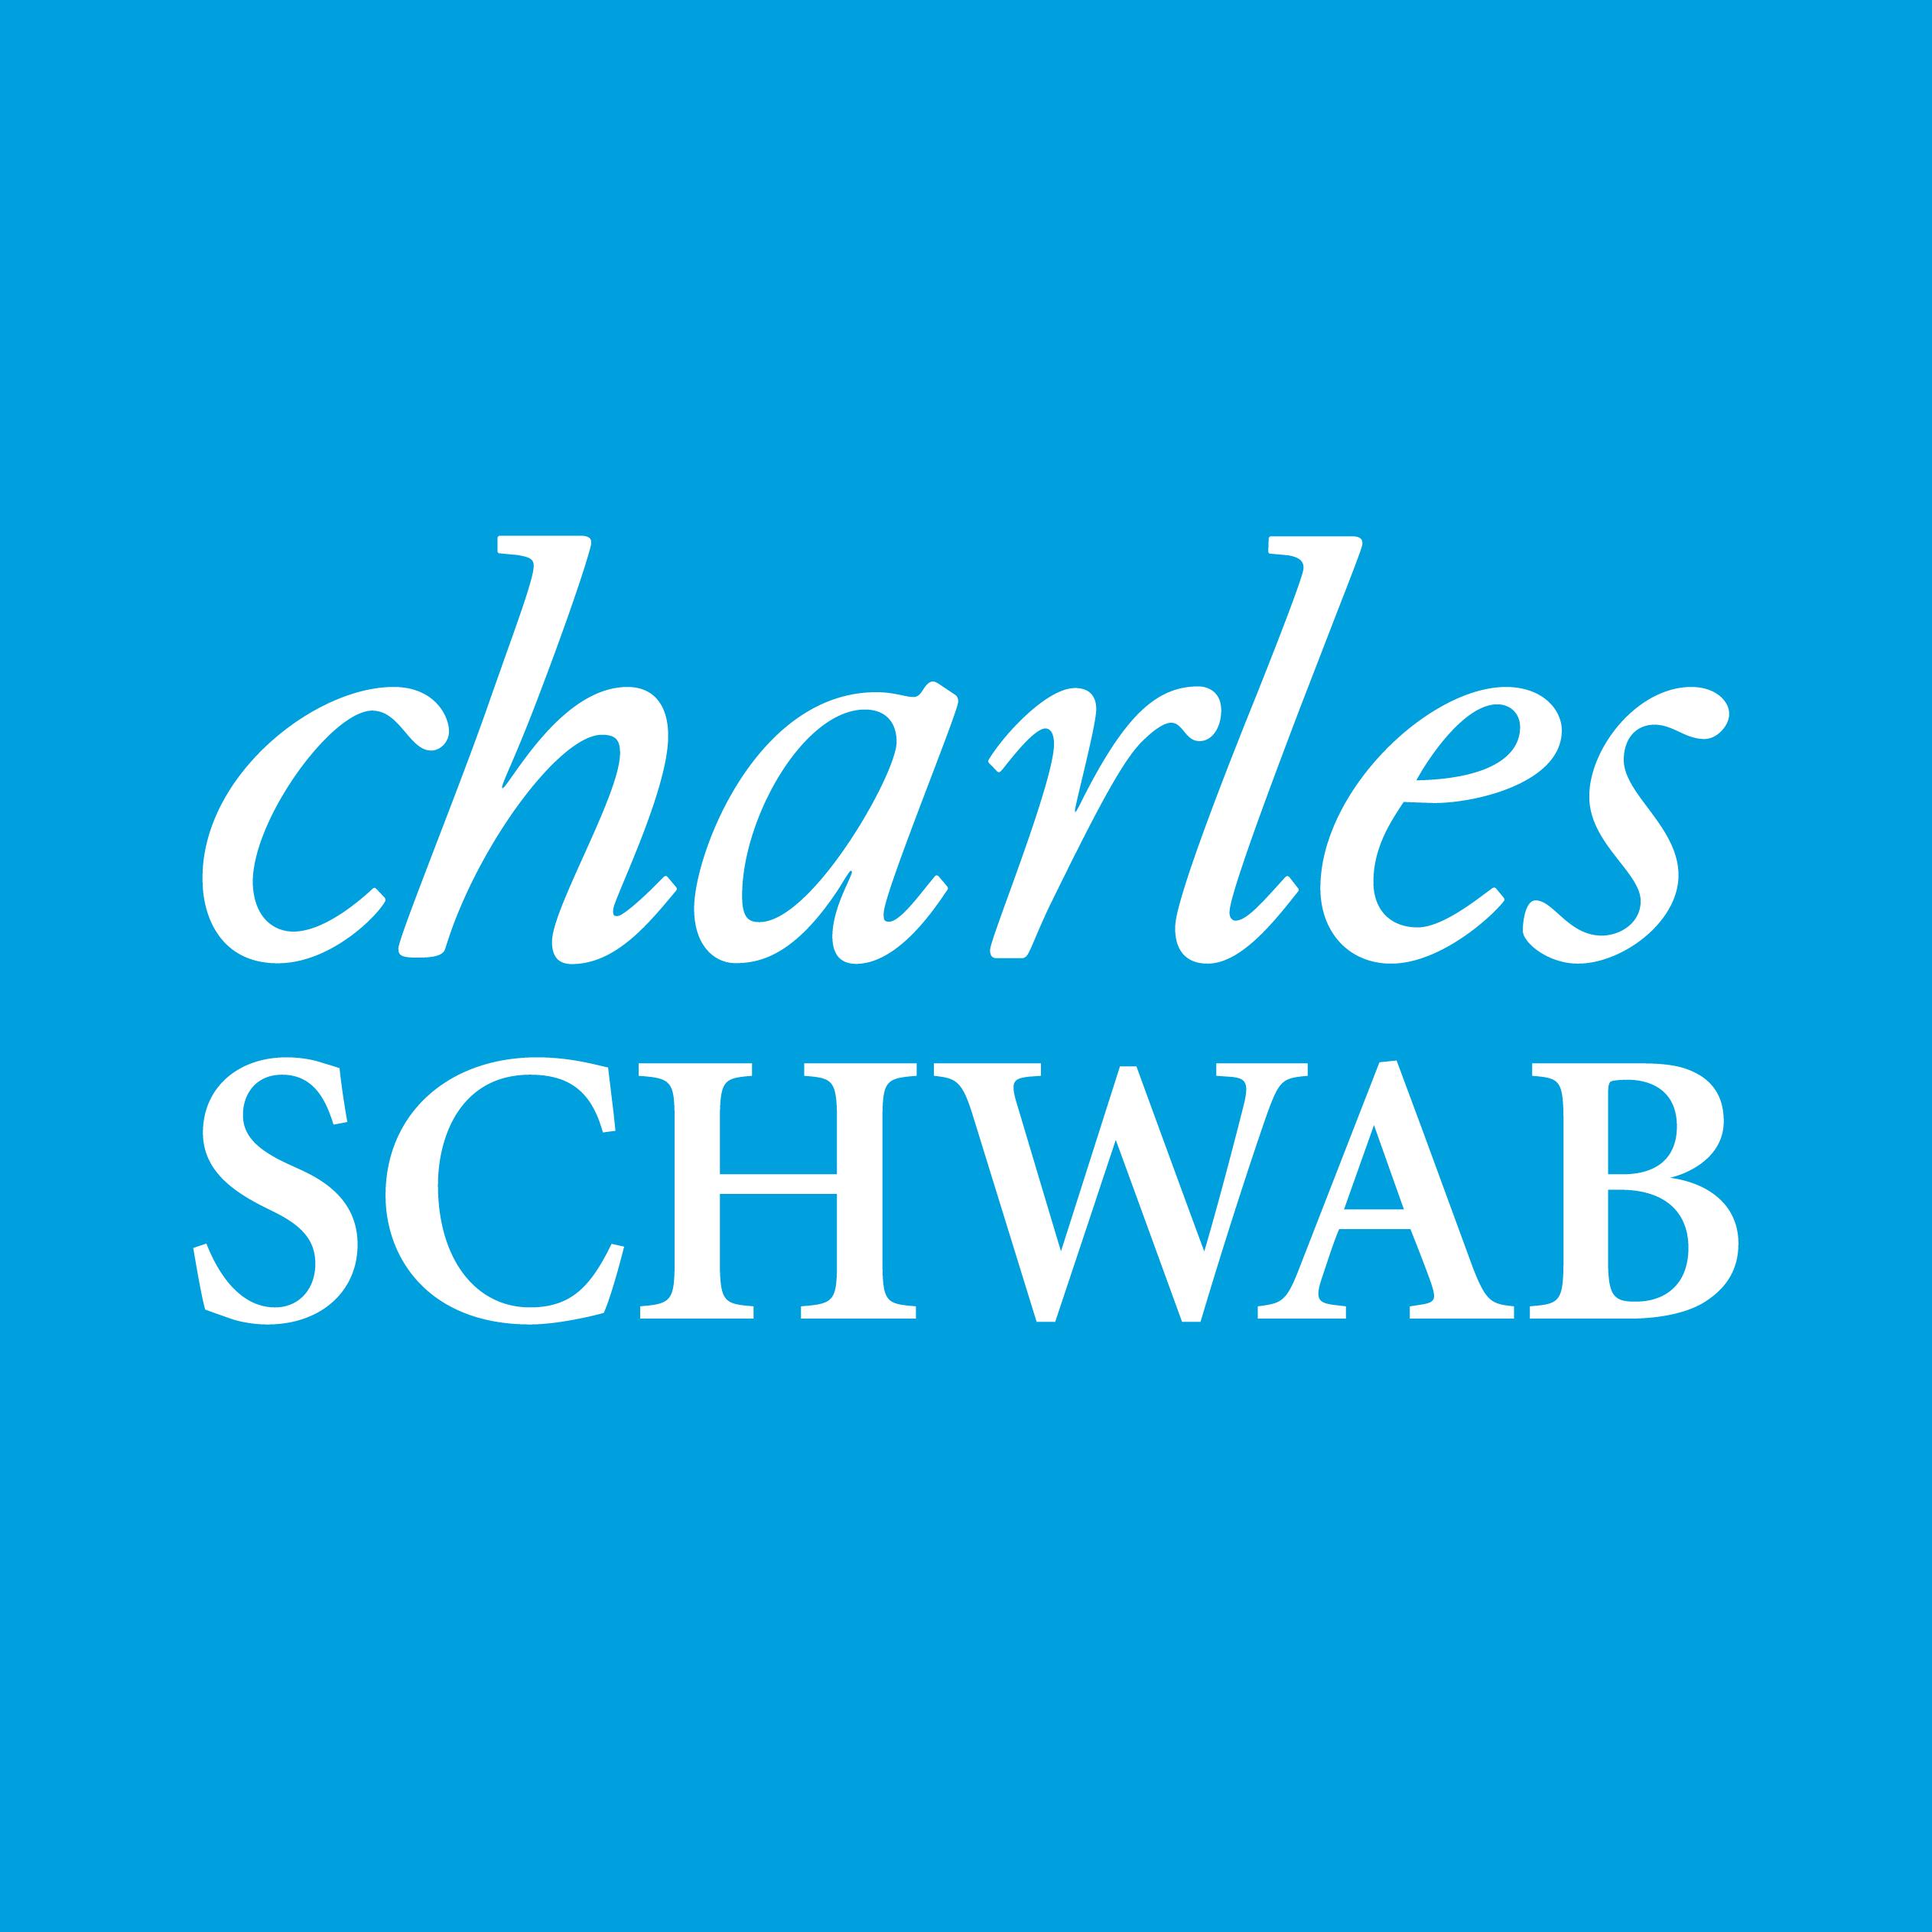 charles-schwab-logo - Madison Advisors